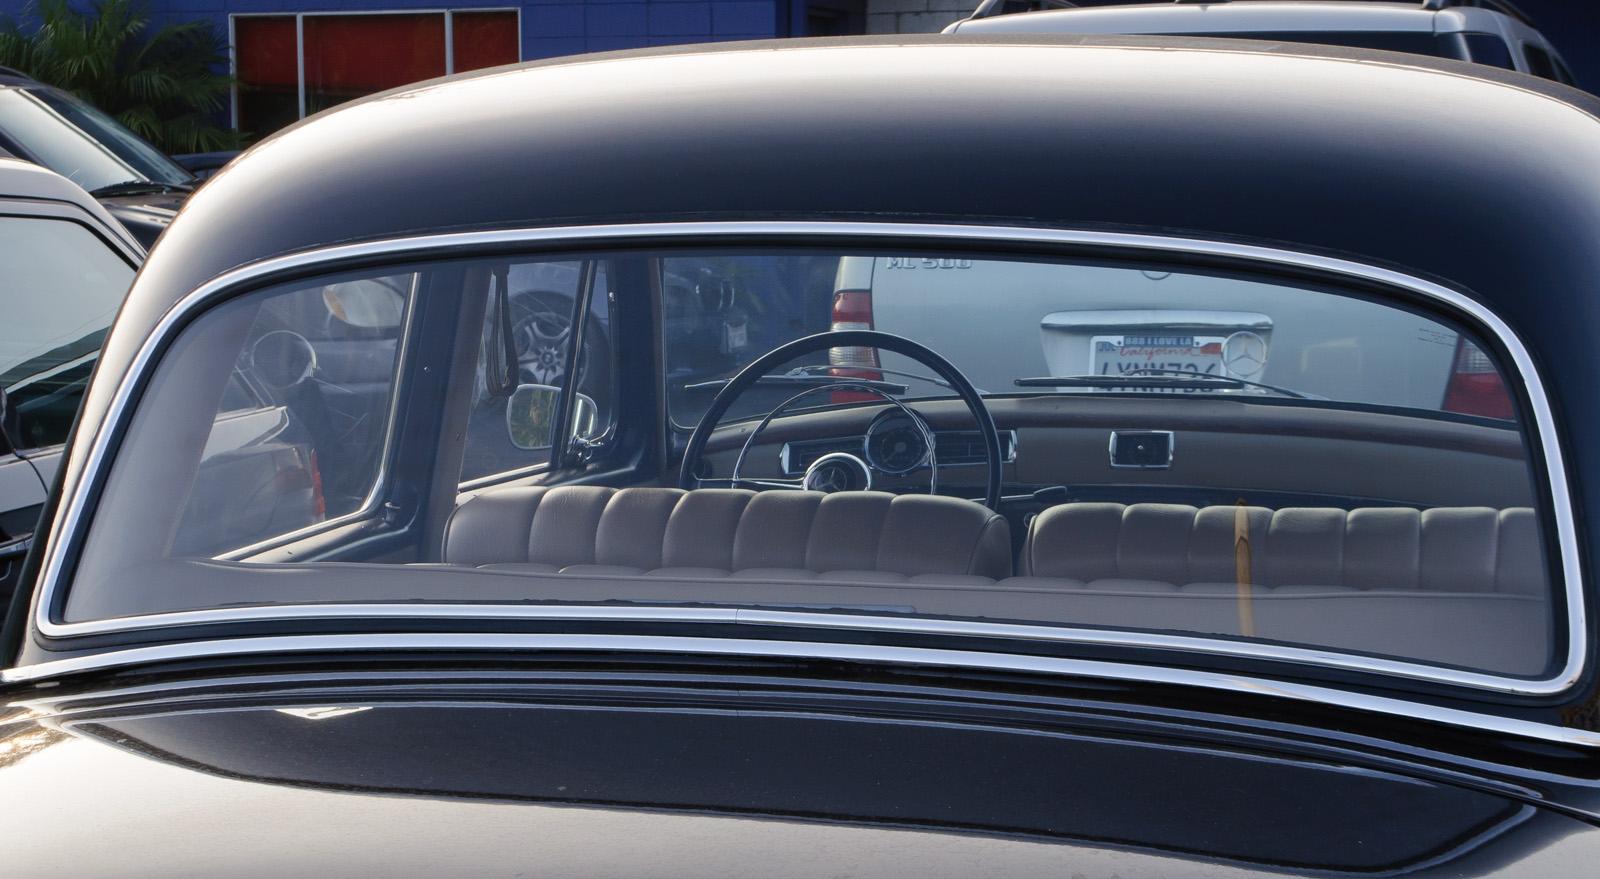 Mercedes ponton custom images for Mercedes benz ponton